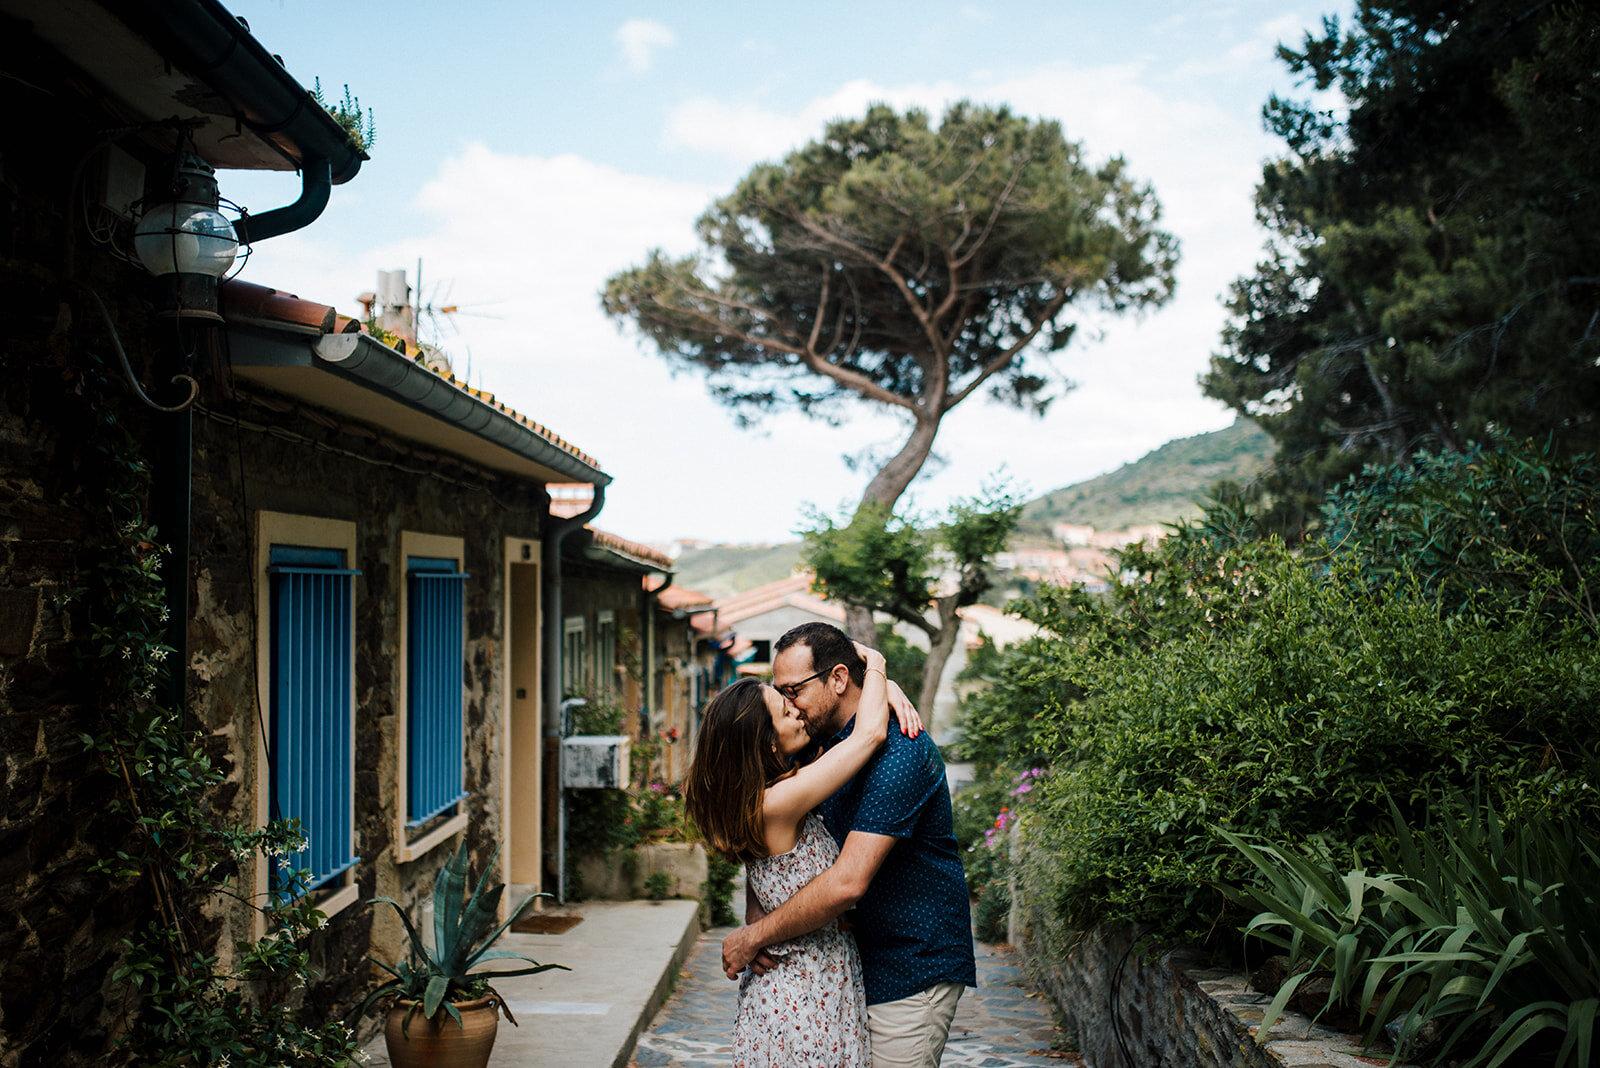 Photographe Mariage et couple Perpignan6.jpg